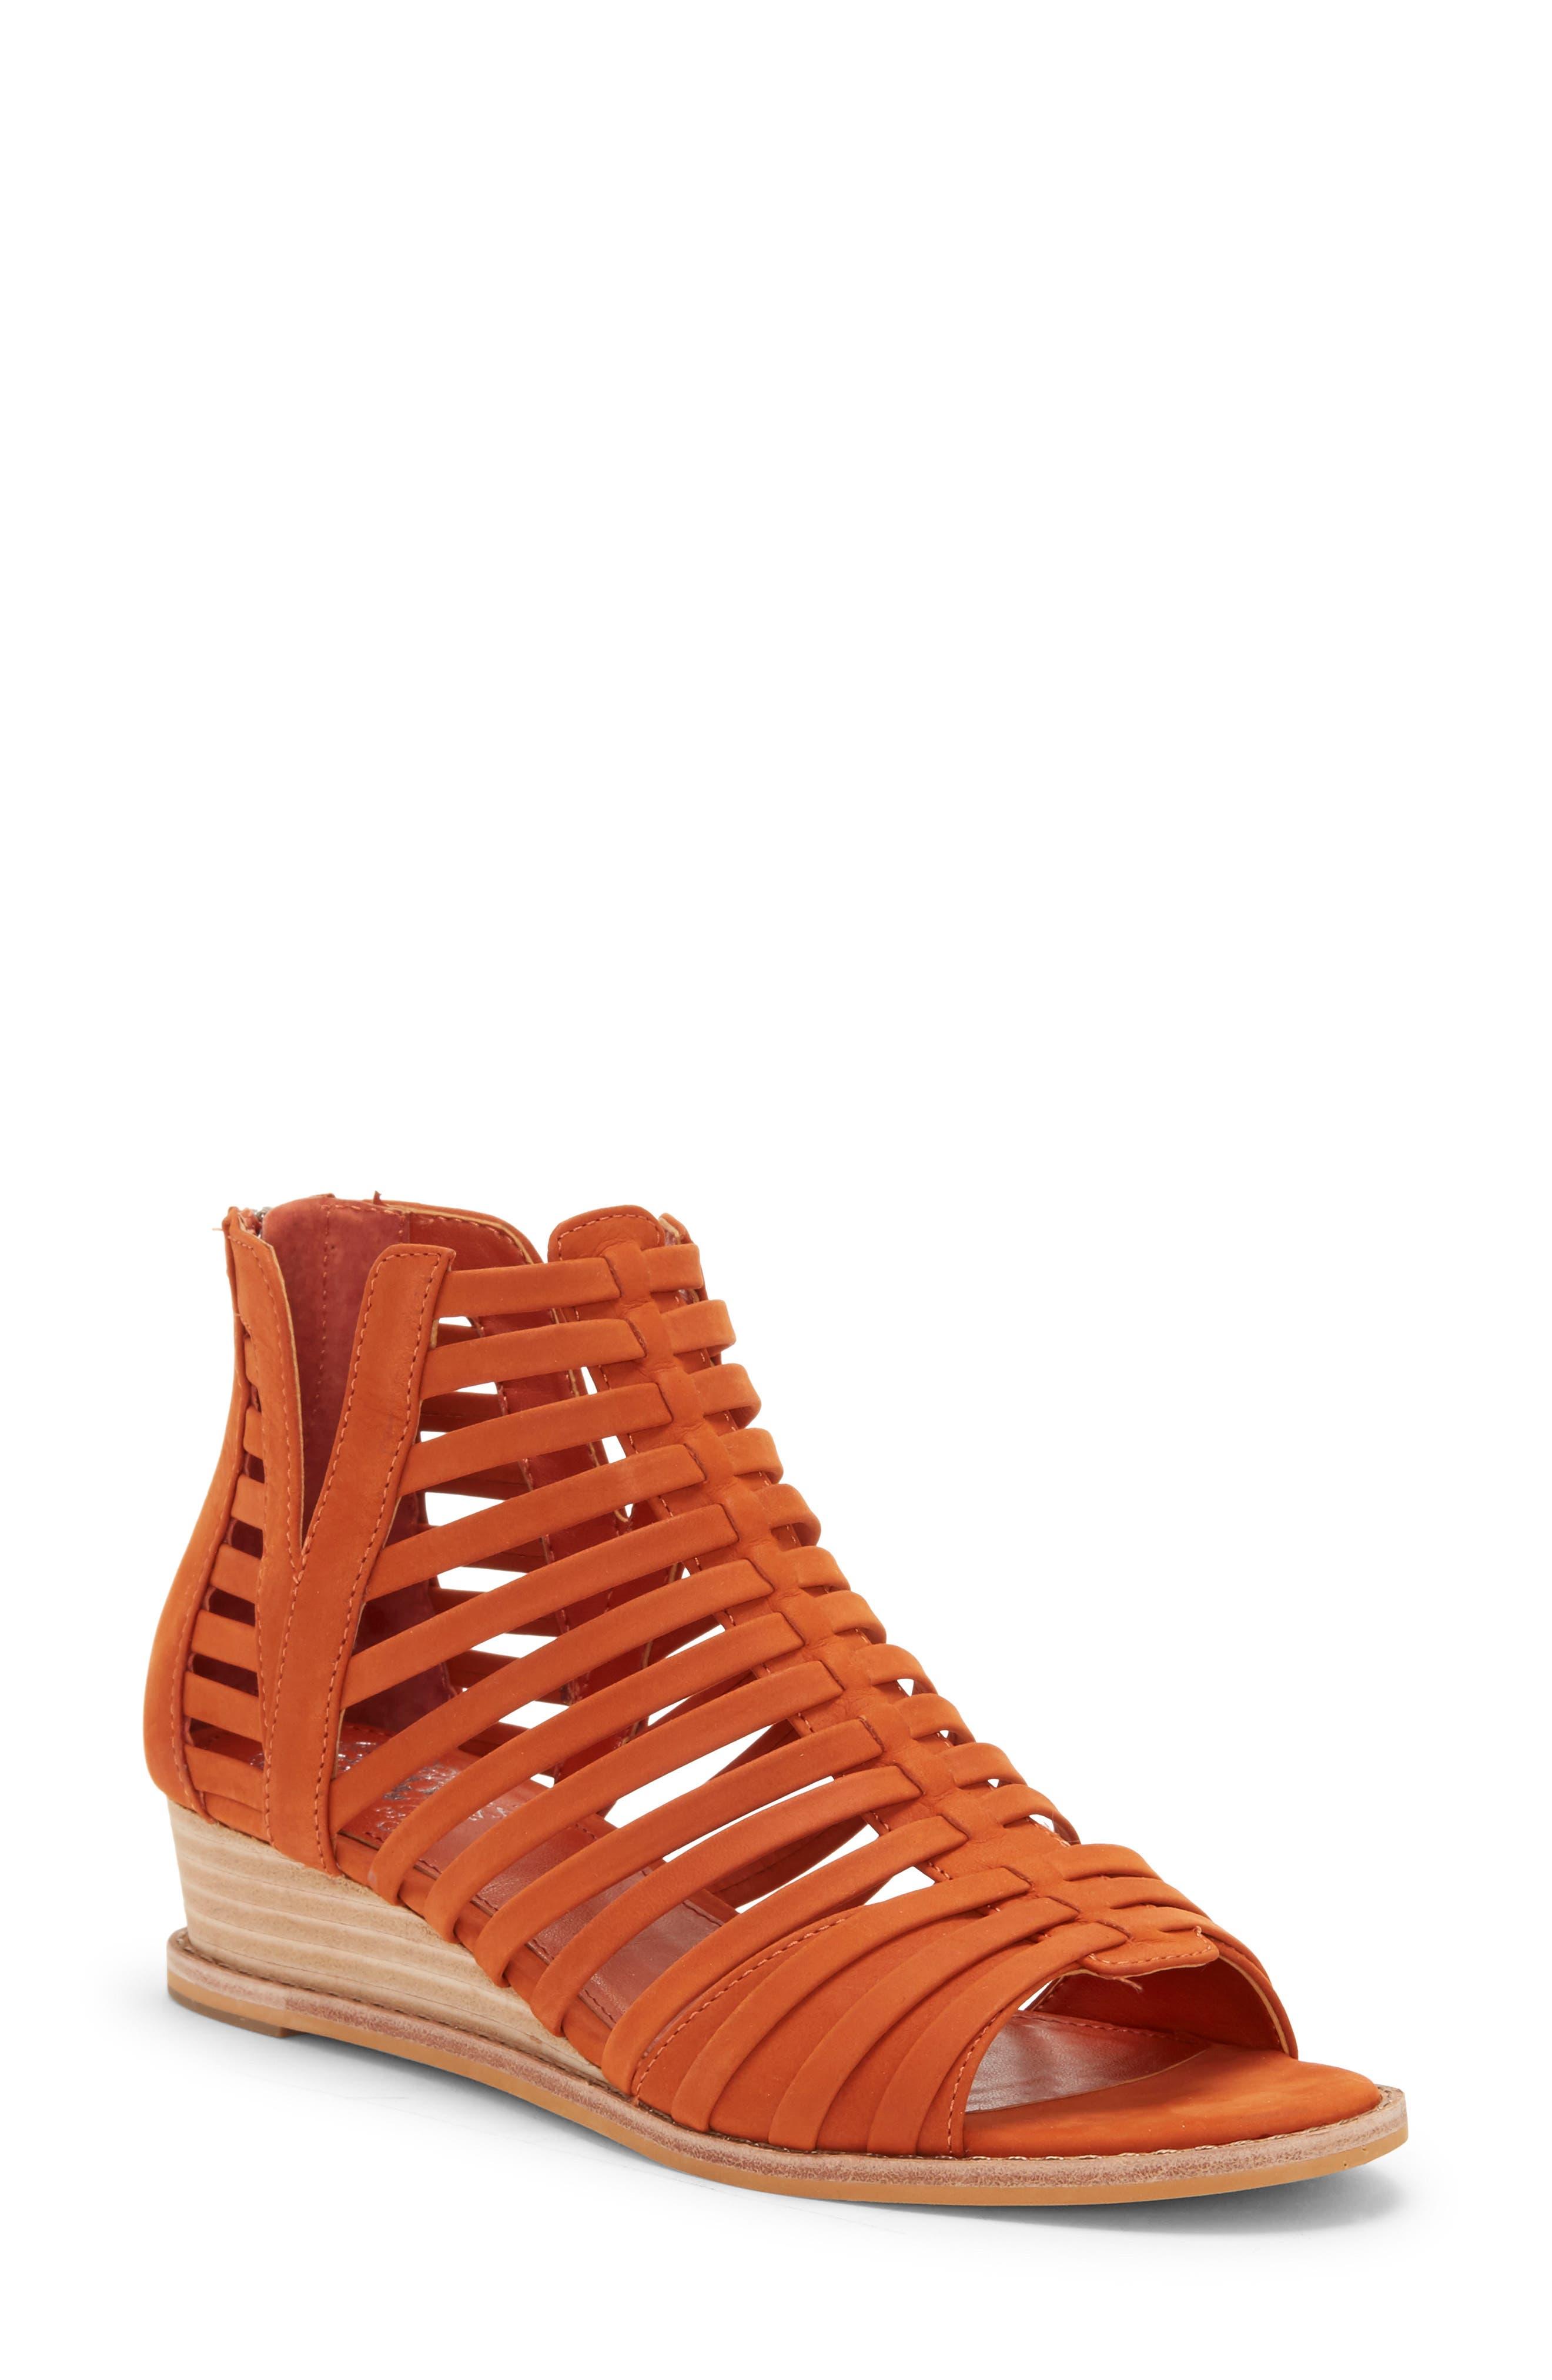 Vince Camuto Revey Wedge Sandal- Orange